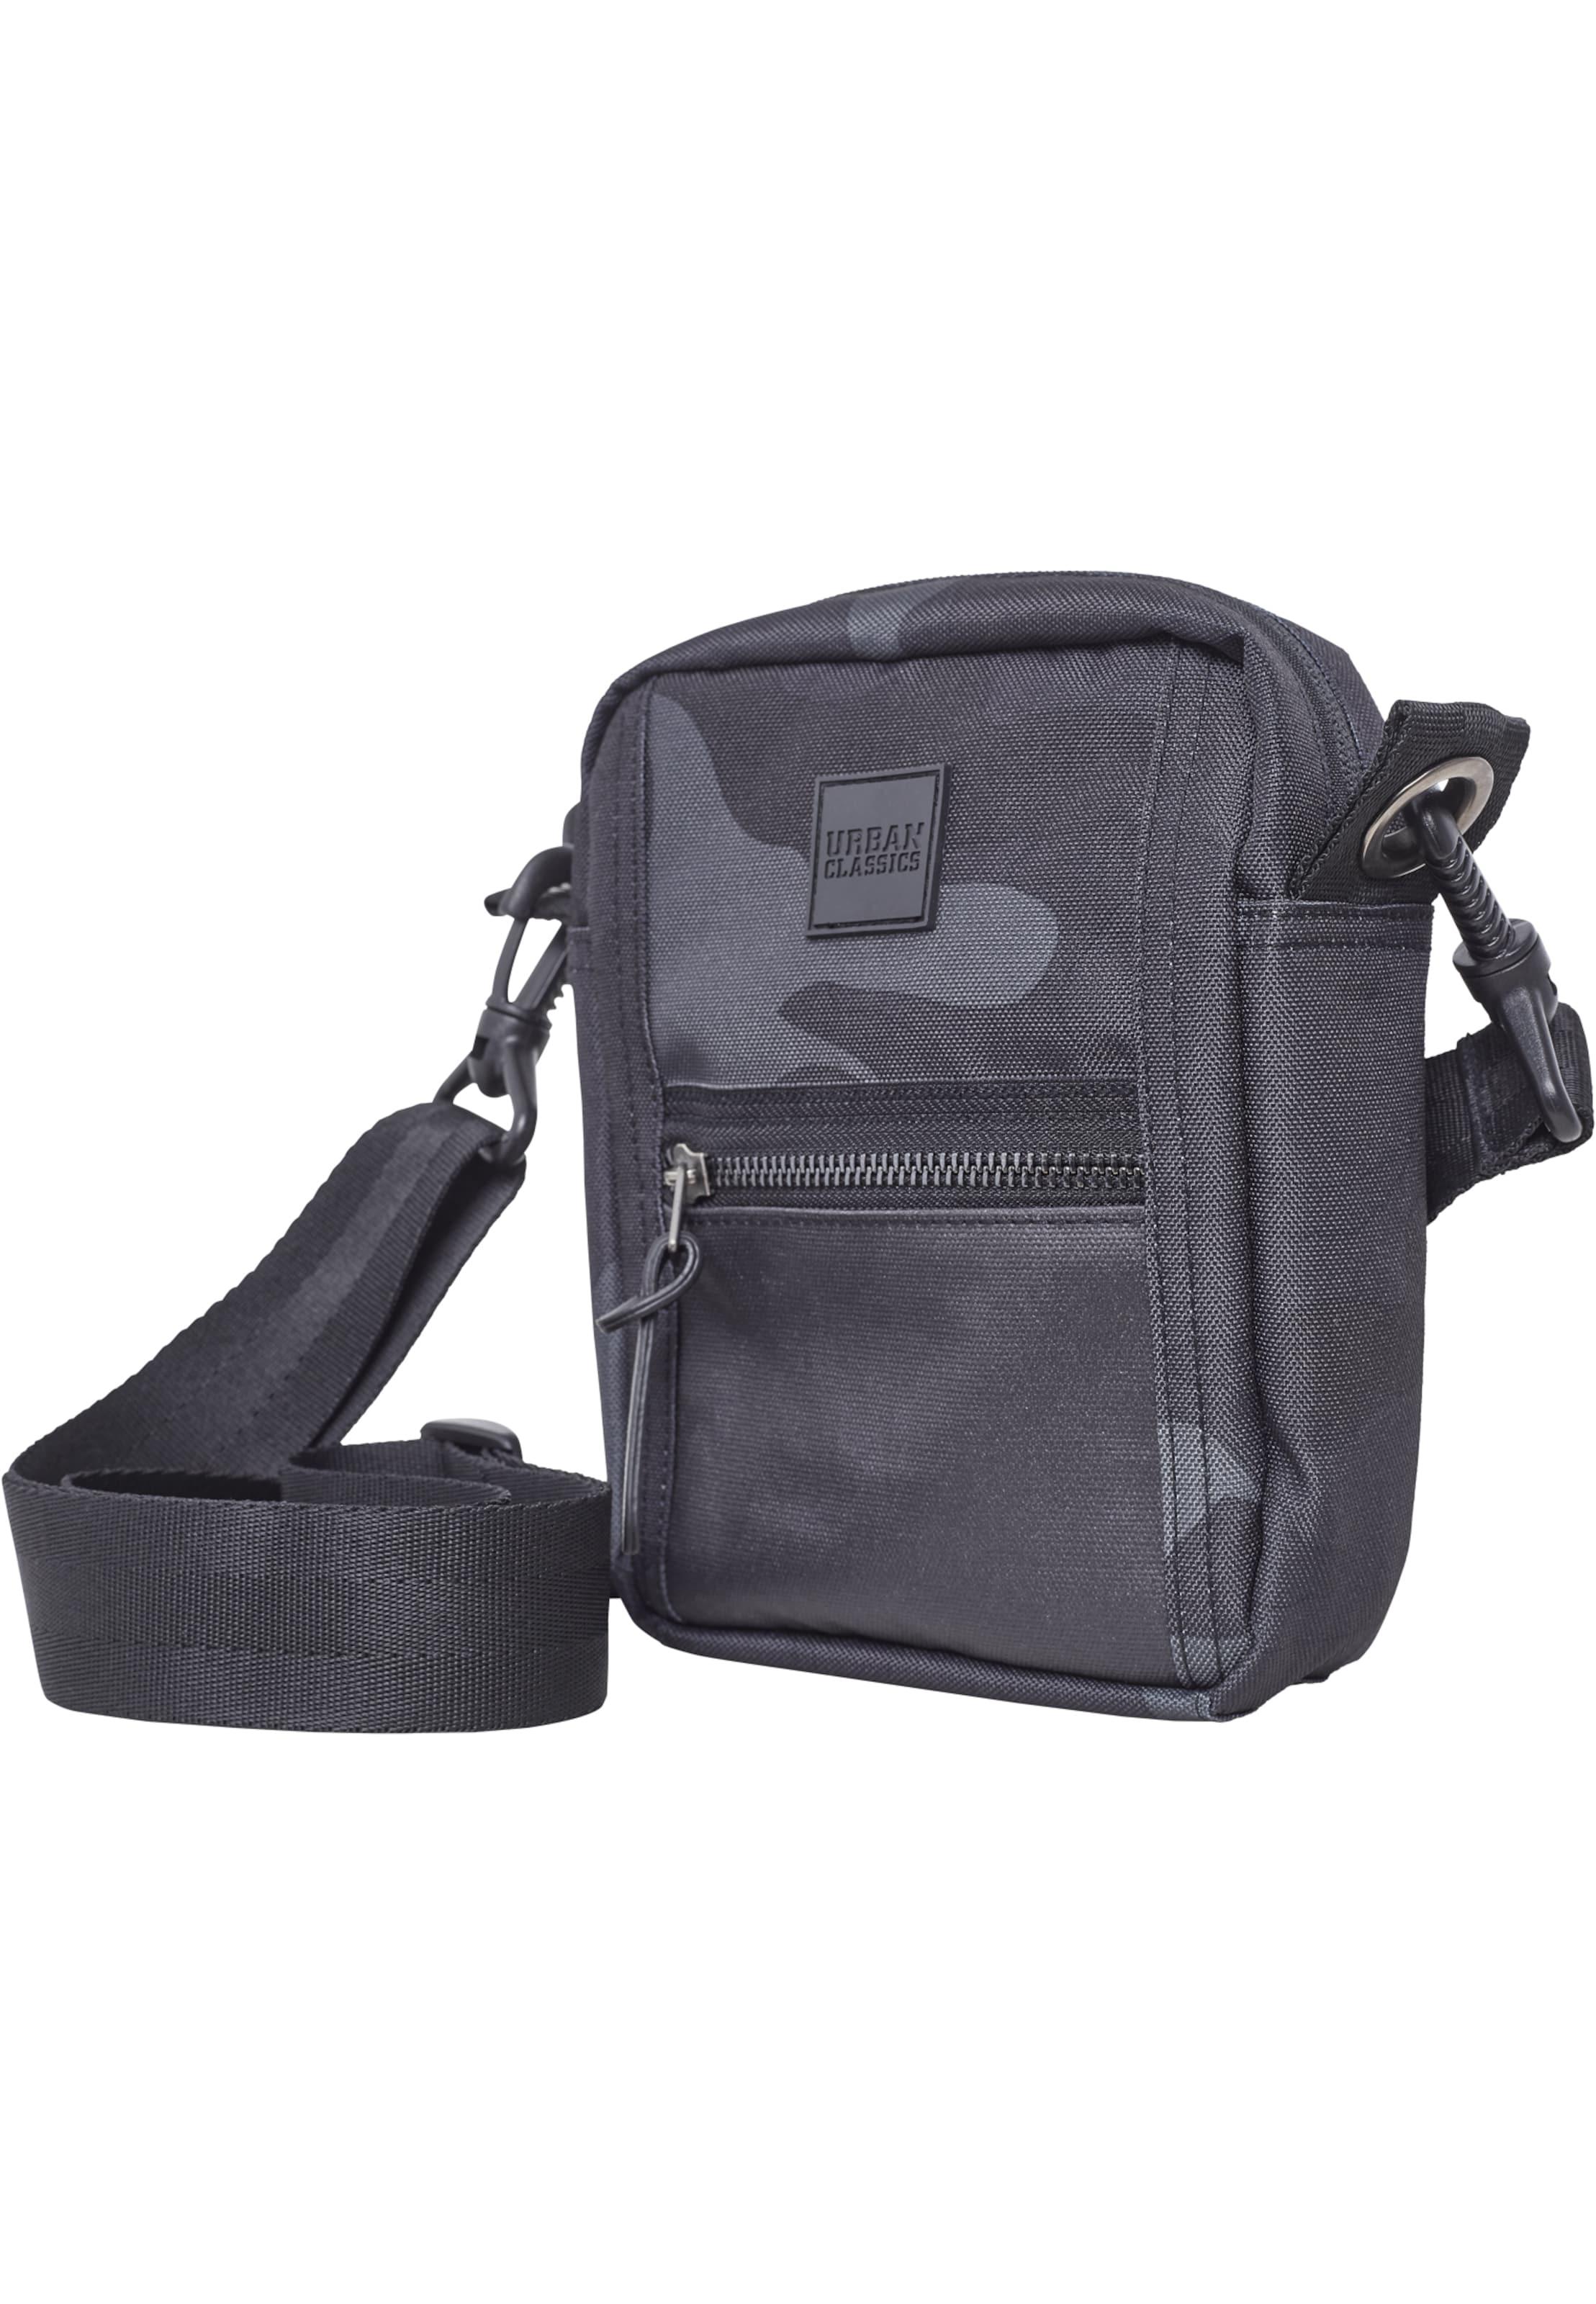 Urban Classics Urban Classics Classics In In Bag Basaltgrau Urban Basaltgrau Bag Bag 7IbvY6ymfg